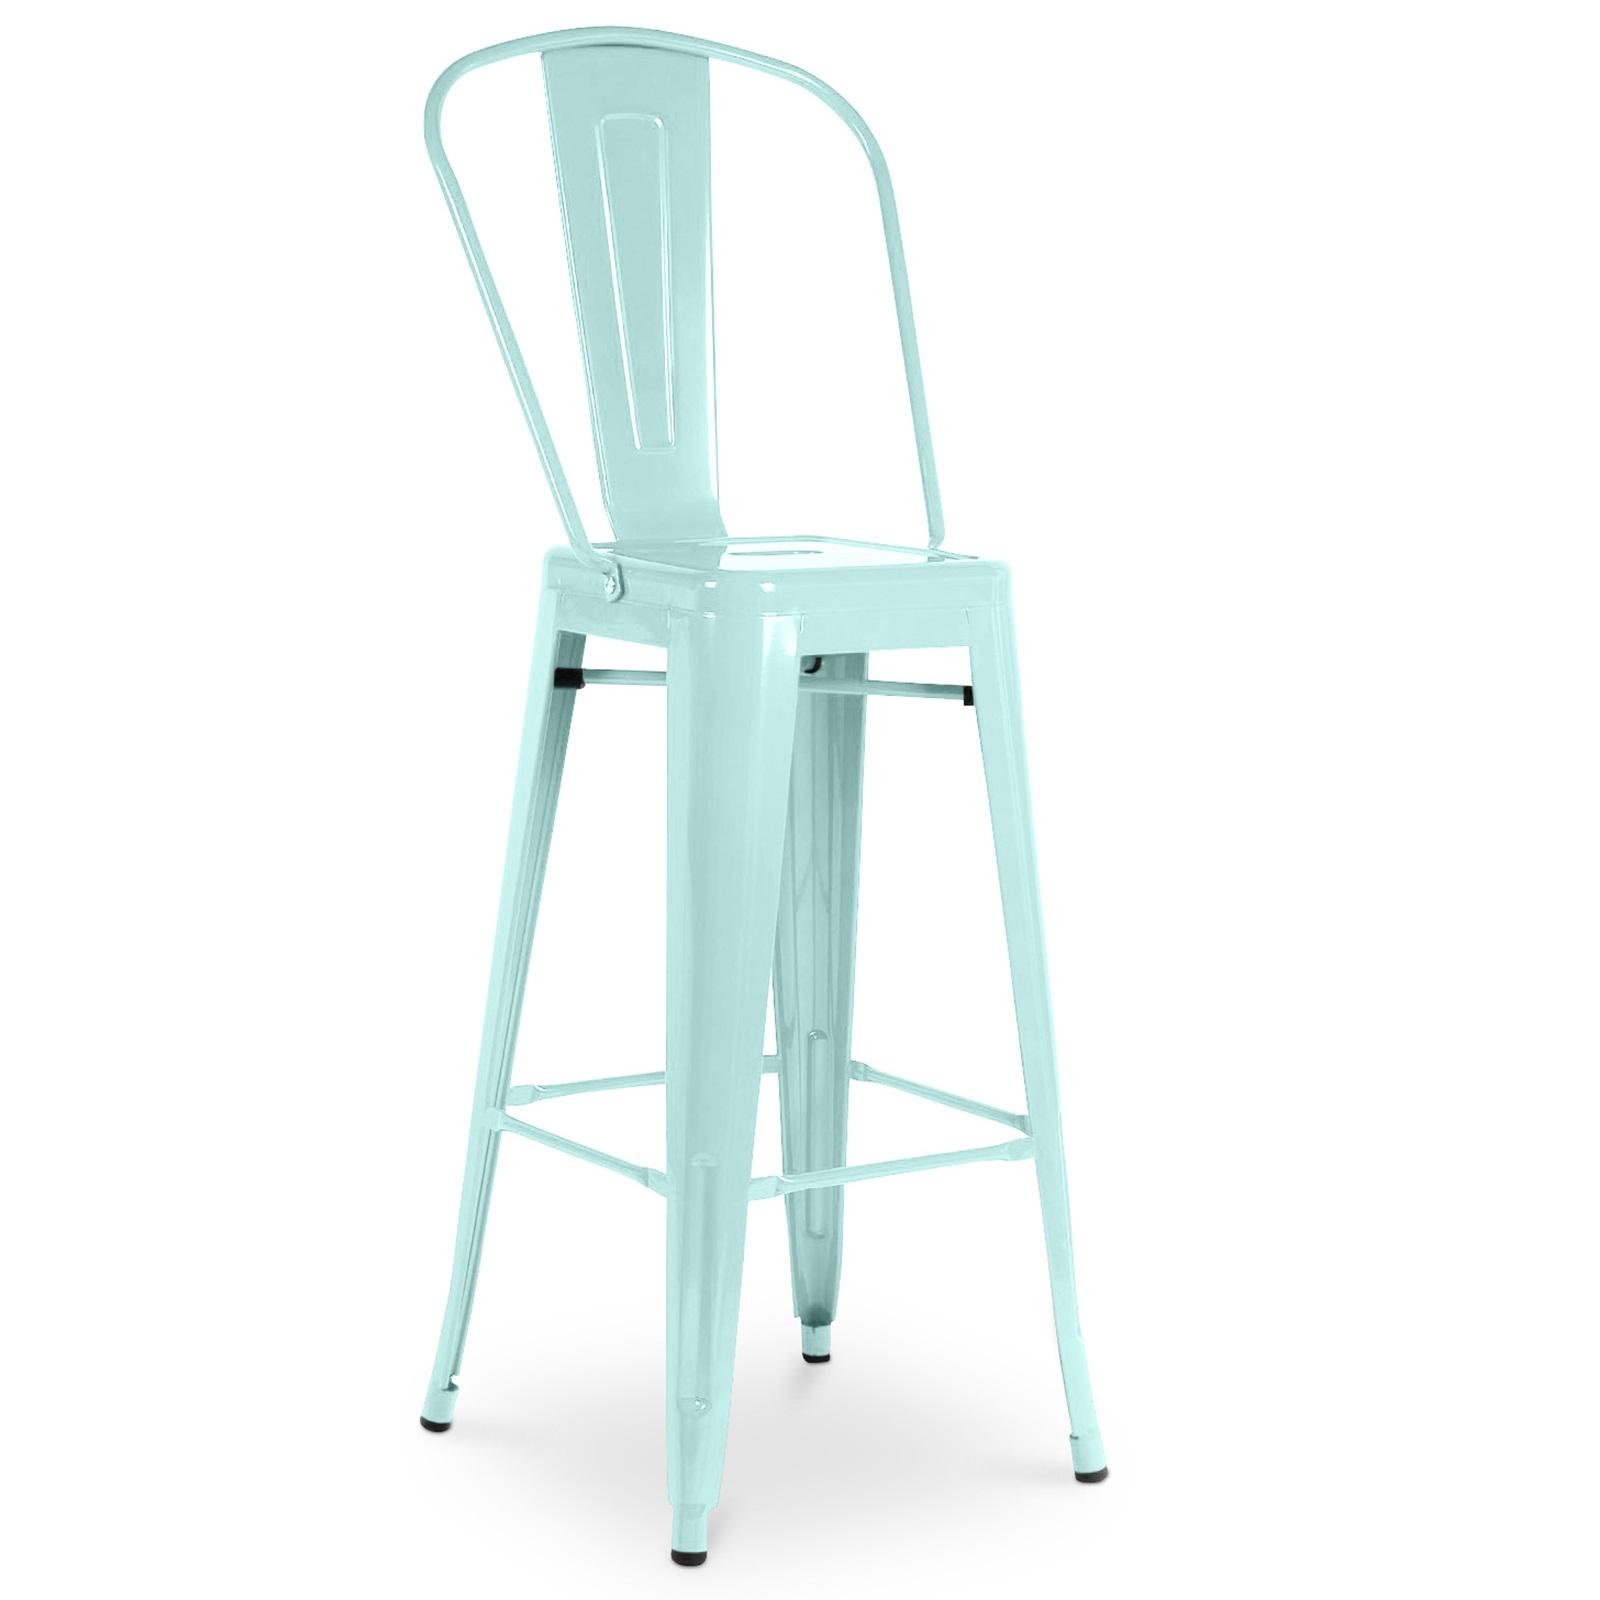 chaise haute m tal brillant bleu clair h 60 industriel. Black Bedroom Furniture Sets. Home Design Ideas